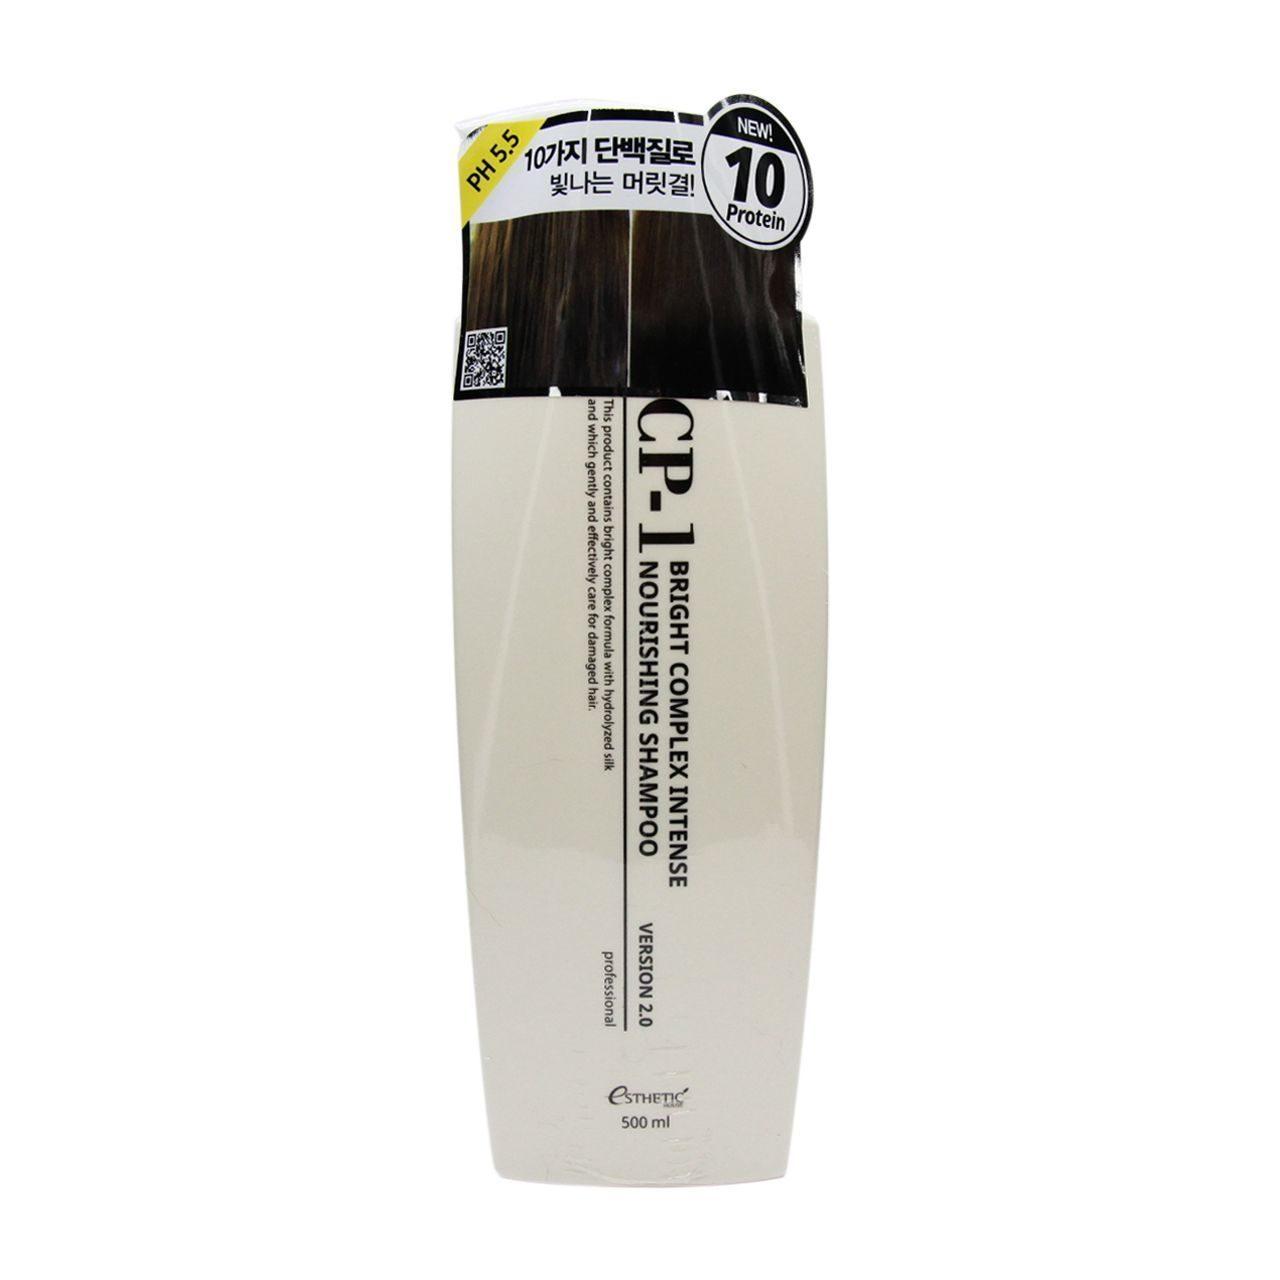 ESTHETIC HOUSE Шампунь для волос ПРОТЕИНОВЫЙ ESTHETIC HOUSE CP-1 BC Intense Nourishing Shampoo Version 2.0 500 мл cml10065fdc7d3c9a855617607671.jpg